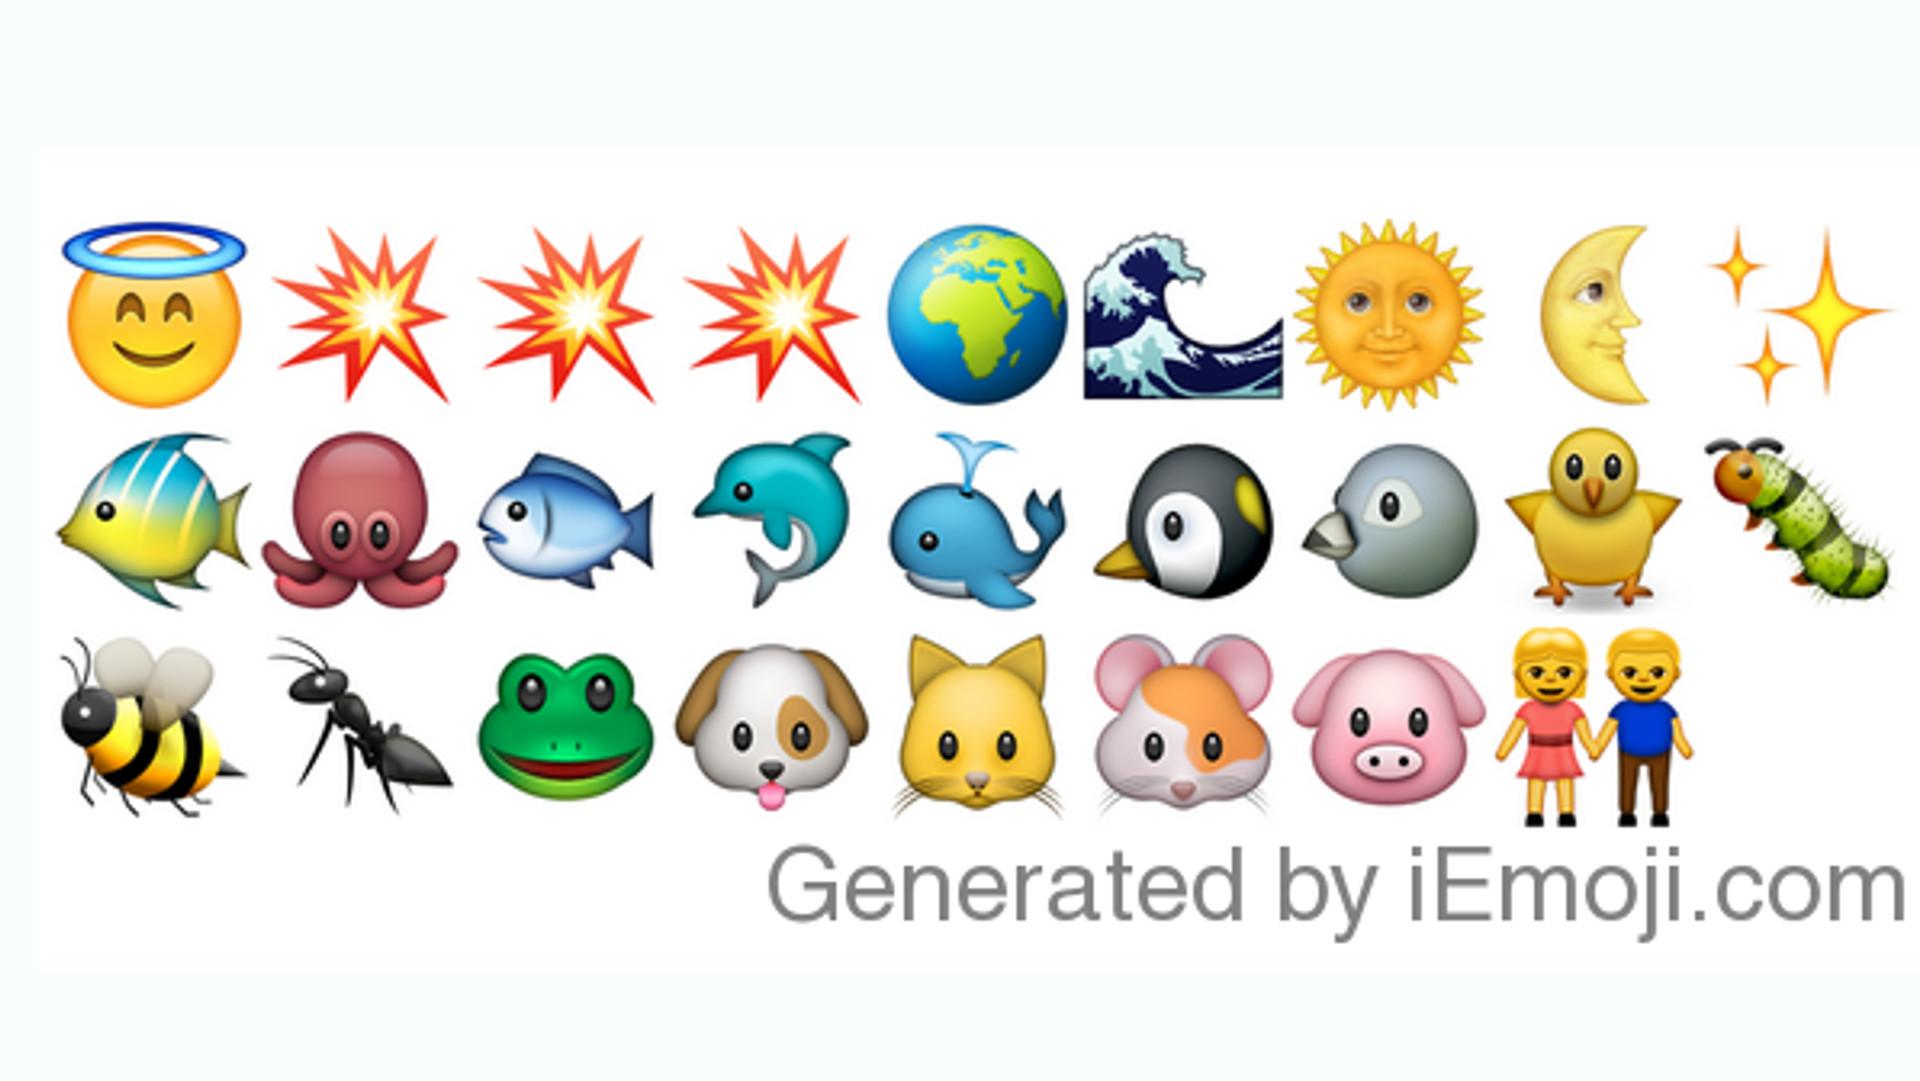 Bibel In Emojis Erschienen Watermelon Wallpaper Rainbow Find Free HD for Desktop [freshlhys.tk]